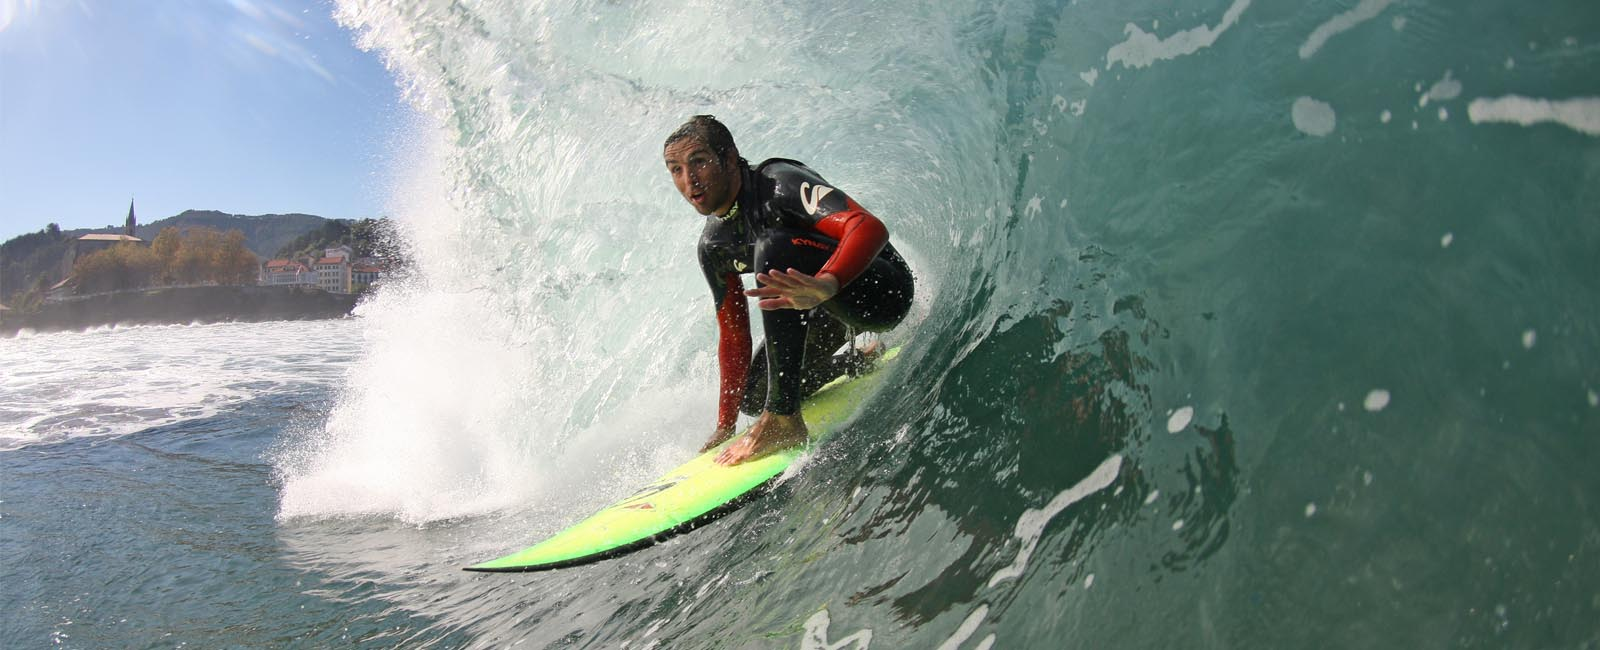 surf-kynay